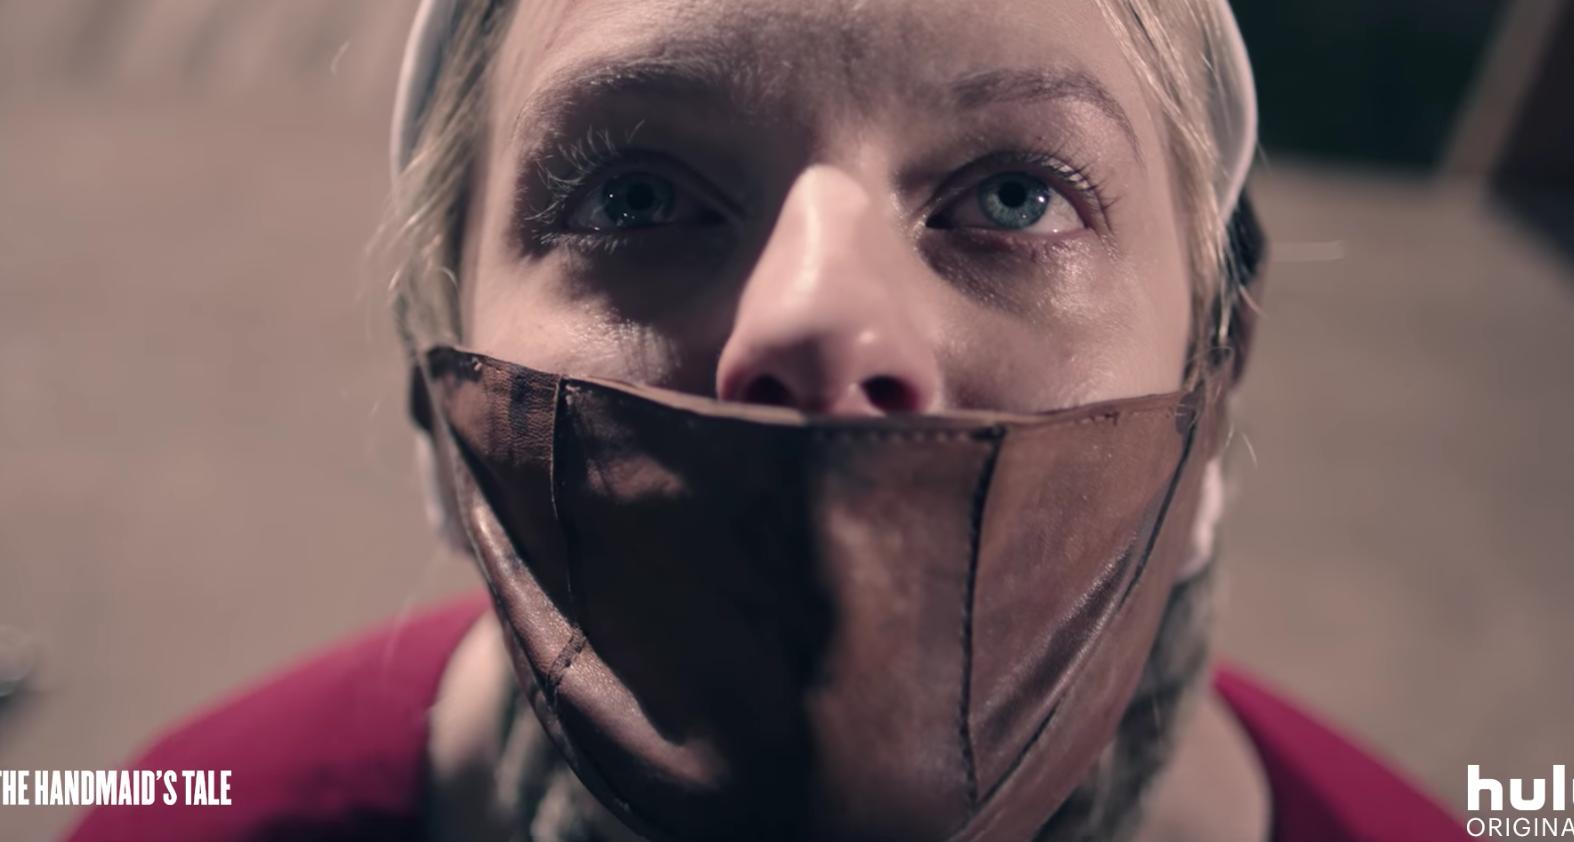 Elisabeth Moss, The Handmaid's Tale (Hulu trailer screenshot, EH)